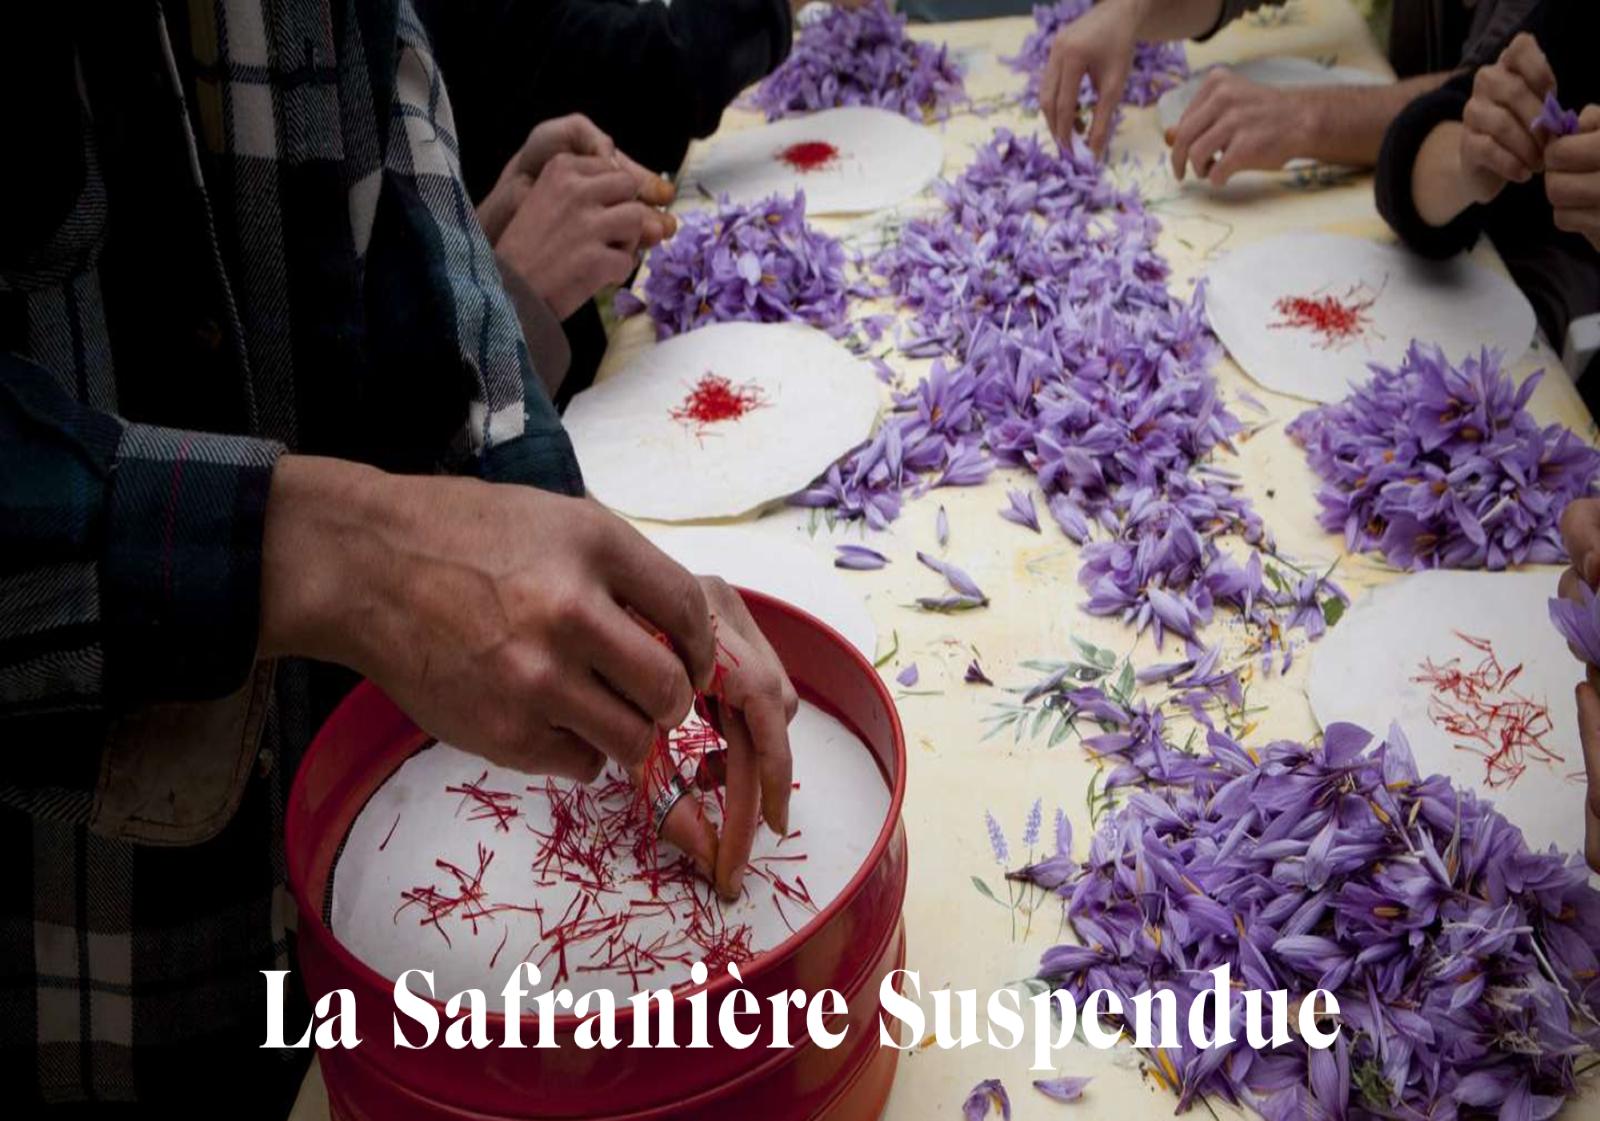 monoprix-la-safraniere-suspendue-paris